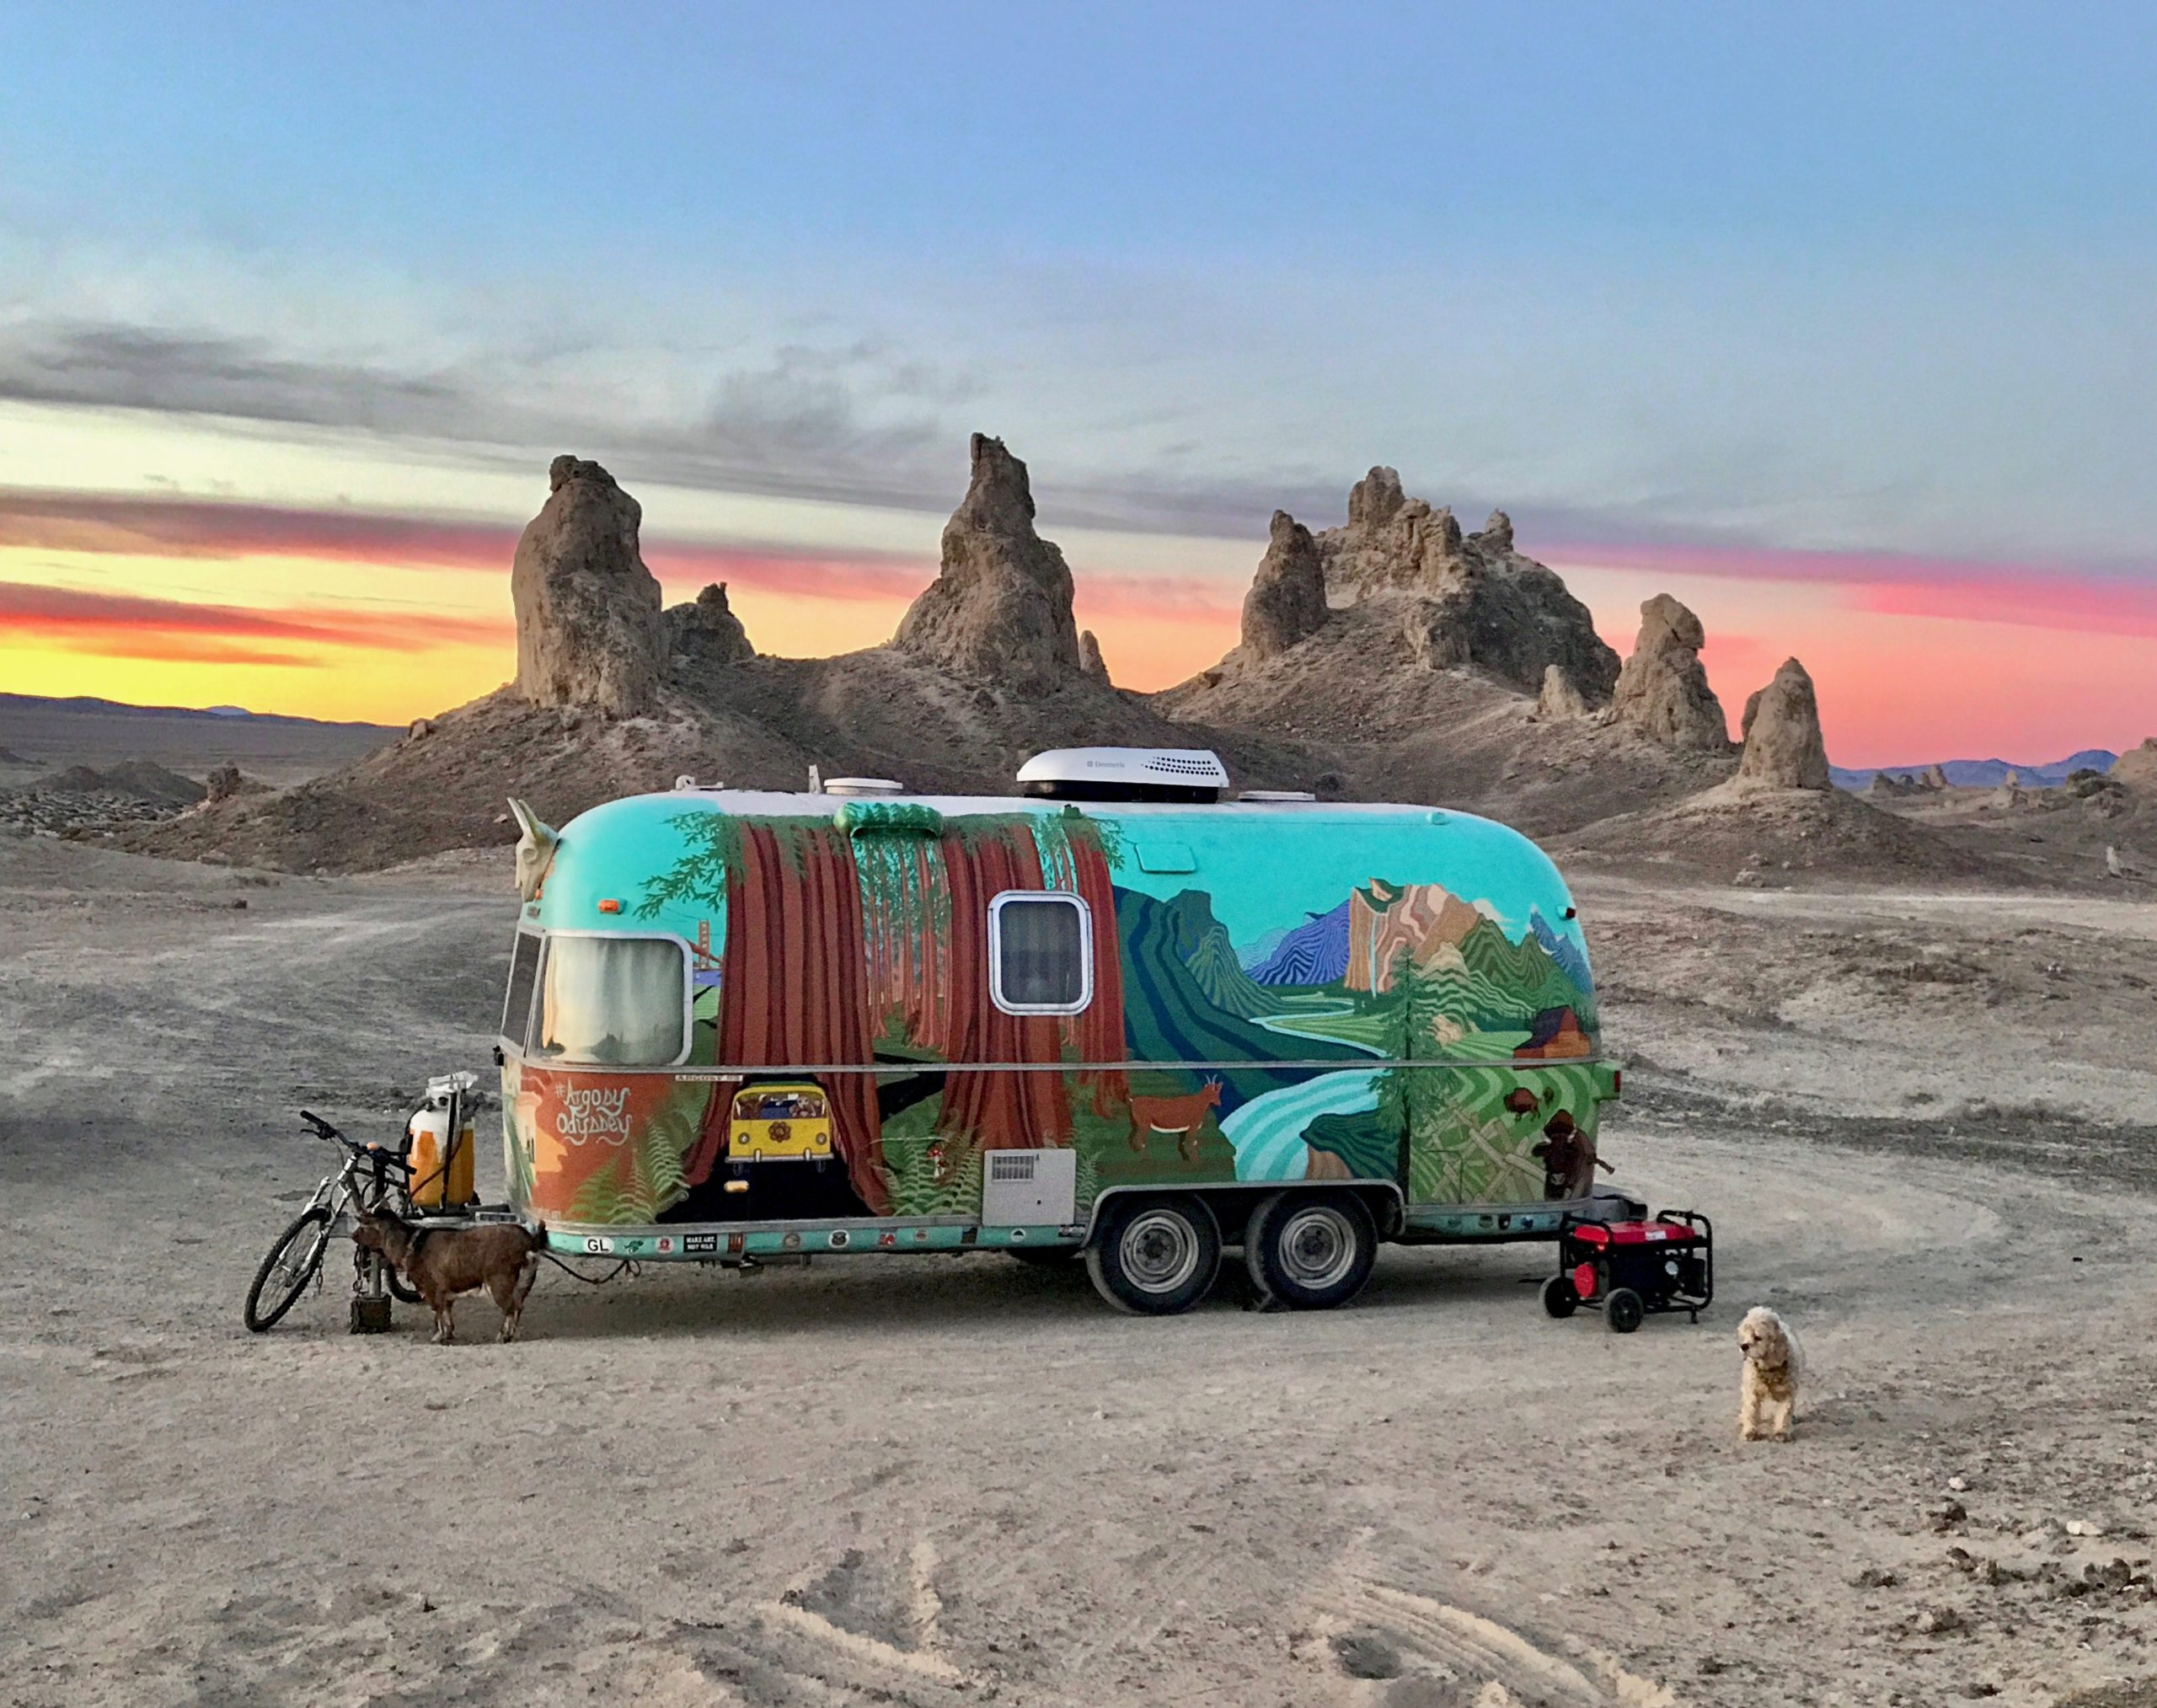 Colorful travel trailer in Trona Pinnacles desert